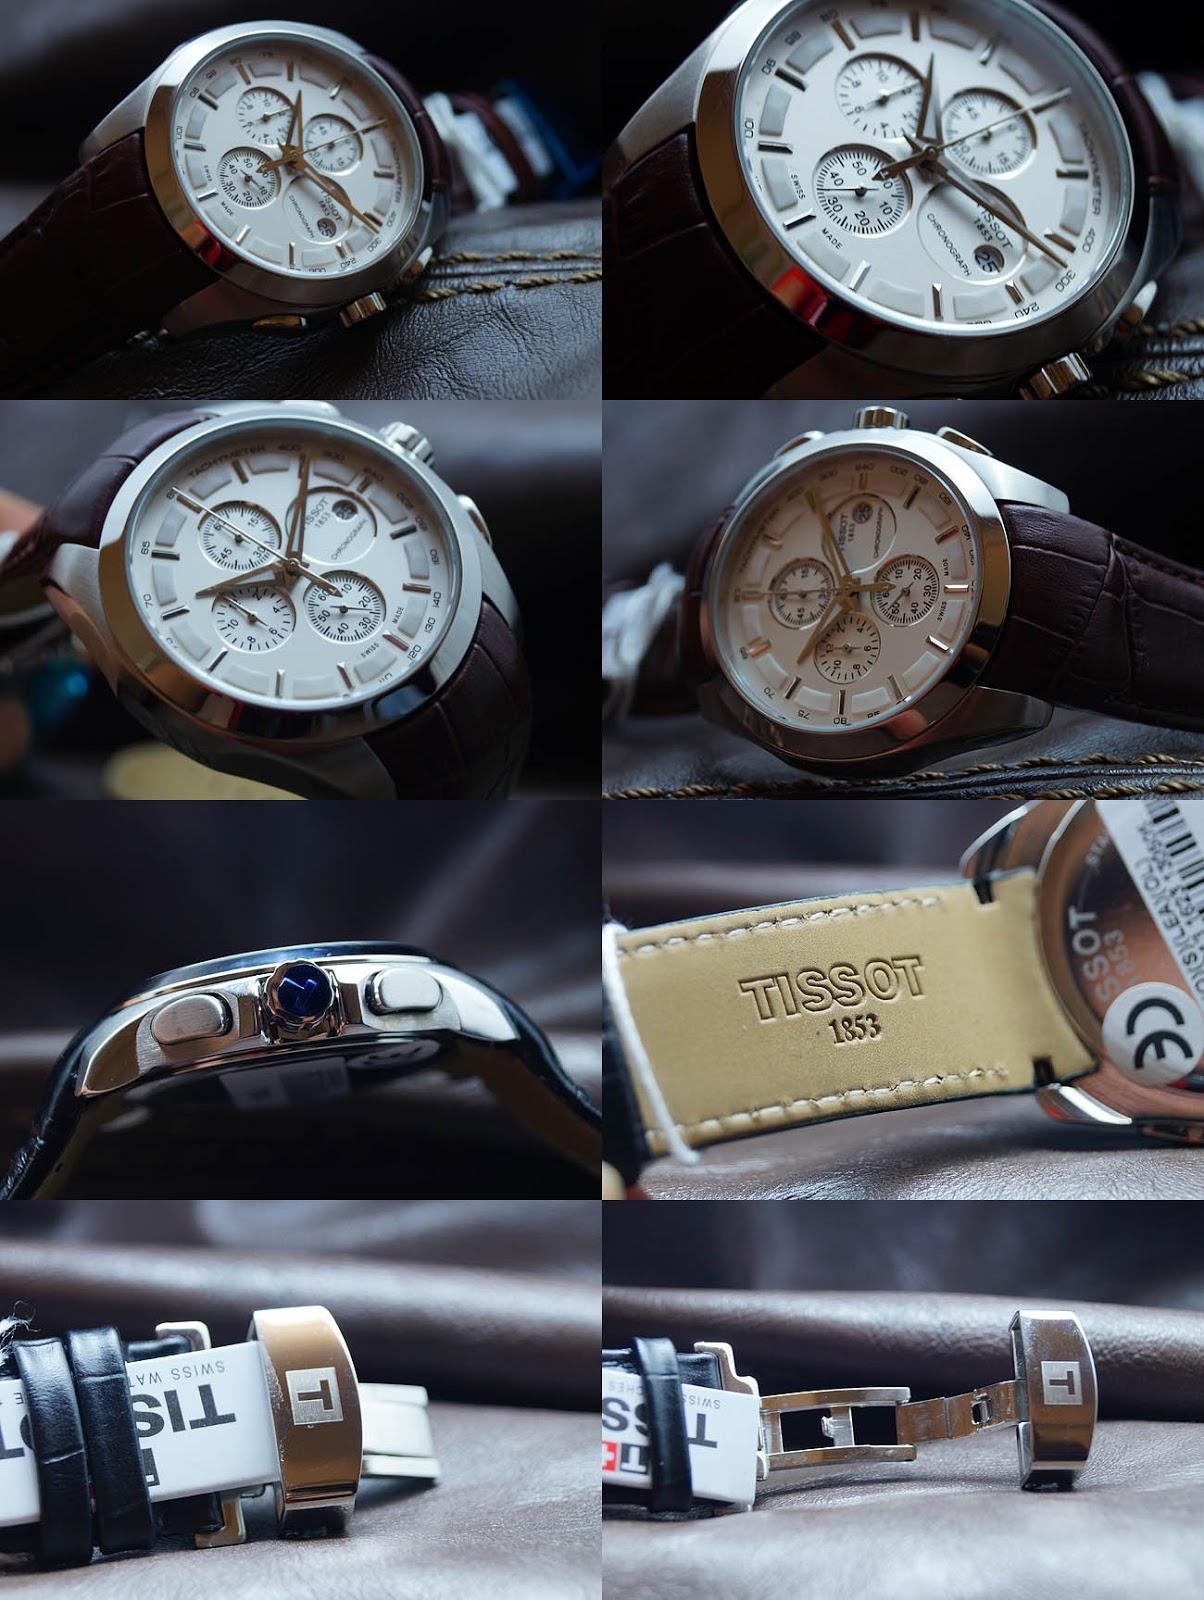 Hasyim Smart Watch April 2013 Casio Sheen Diamond Shn 5012lp 41mm Case Diameter Size